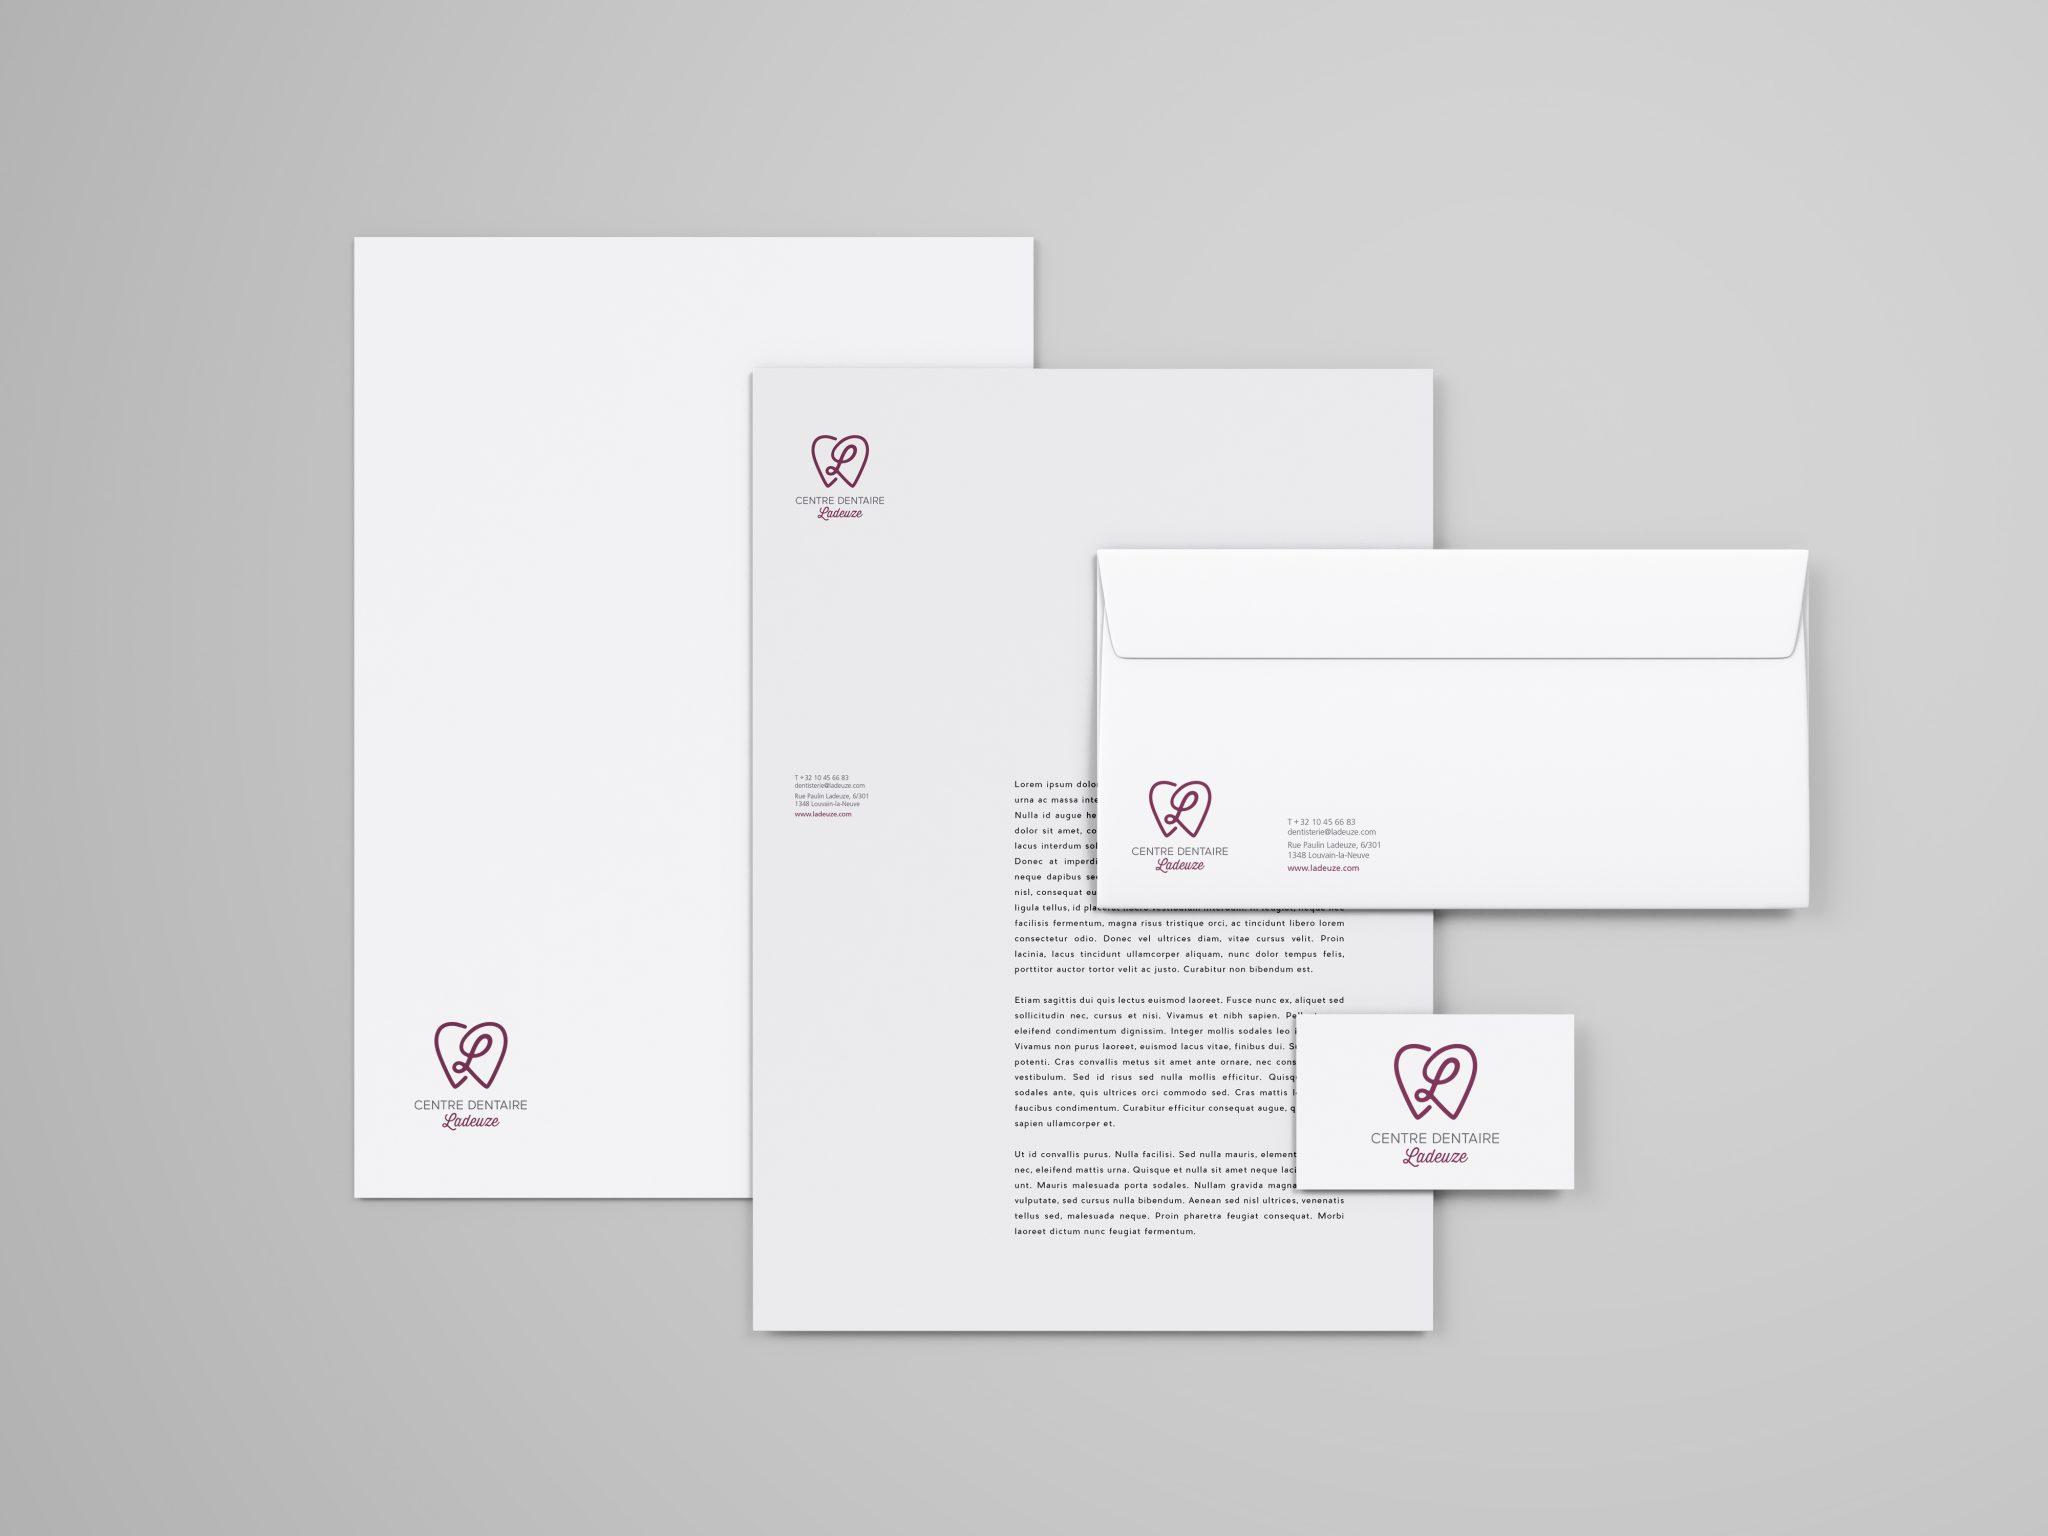 studio witvrouwen graphic design identity branding logotype logo papeterie